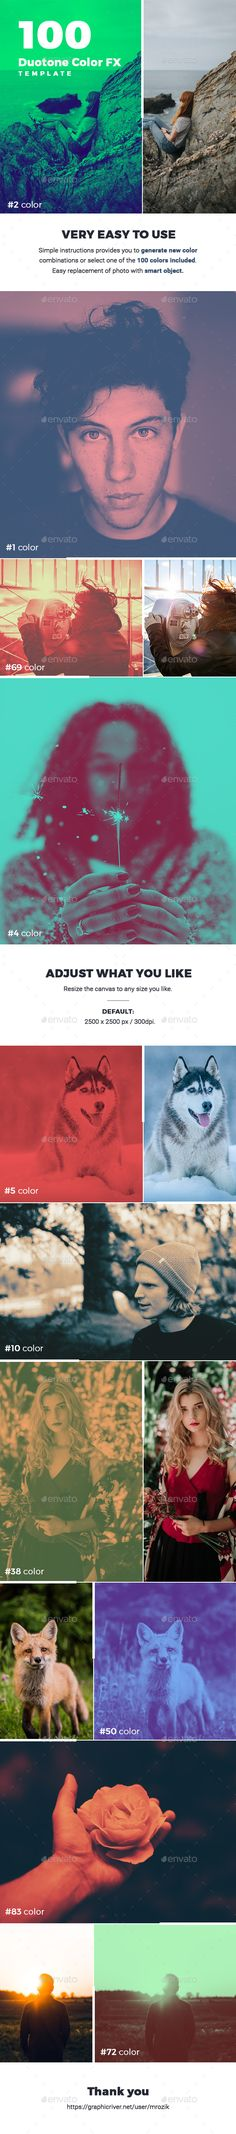 100 Duotone FX Photo Template - Photo Templates Graphics